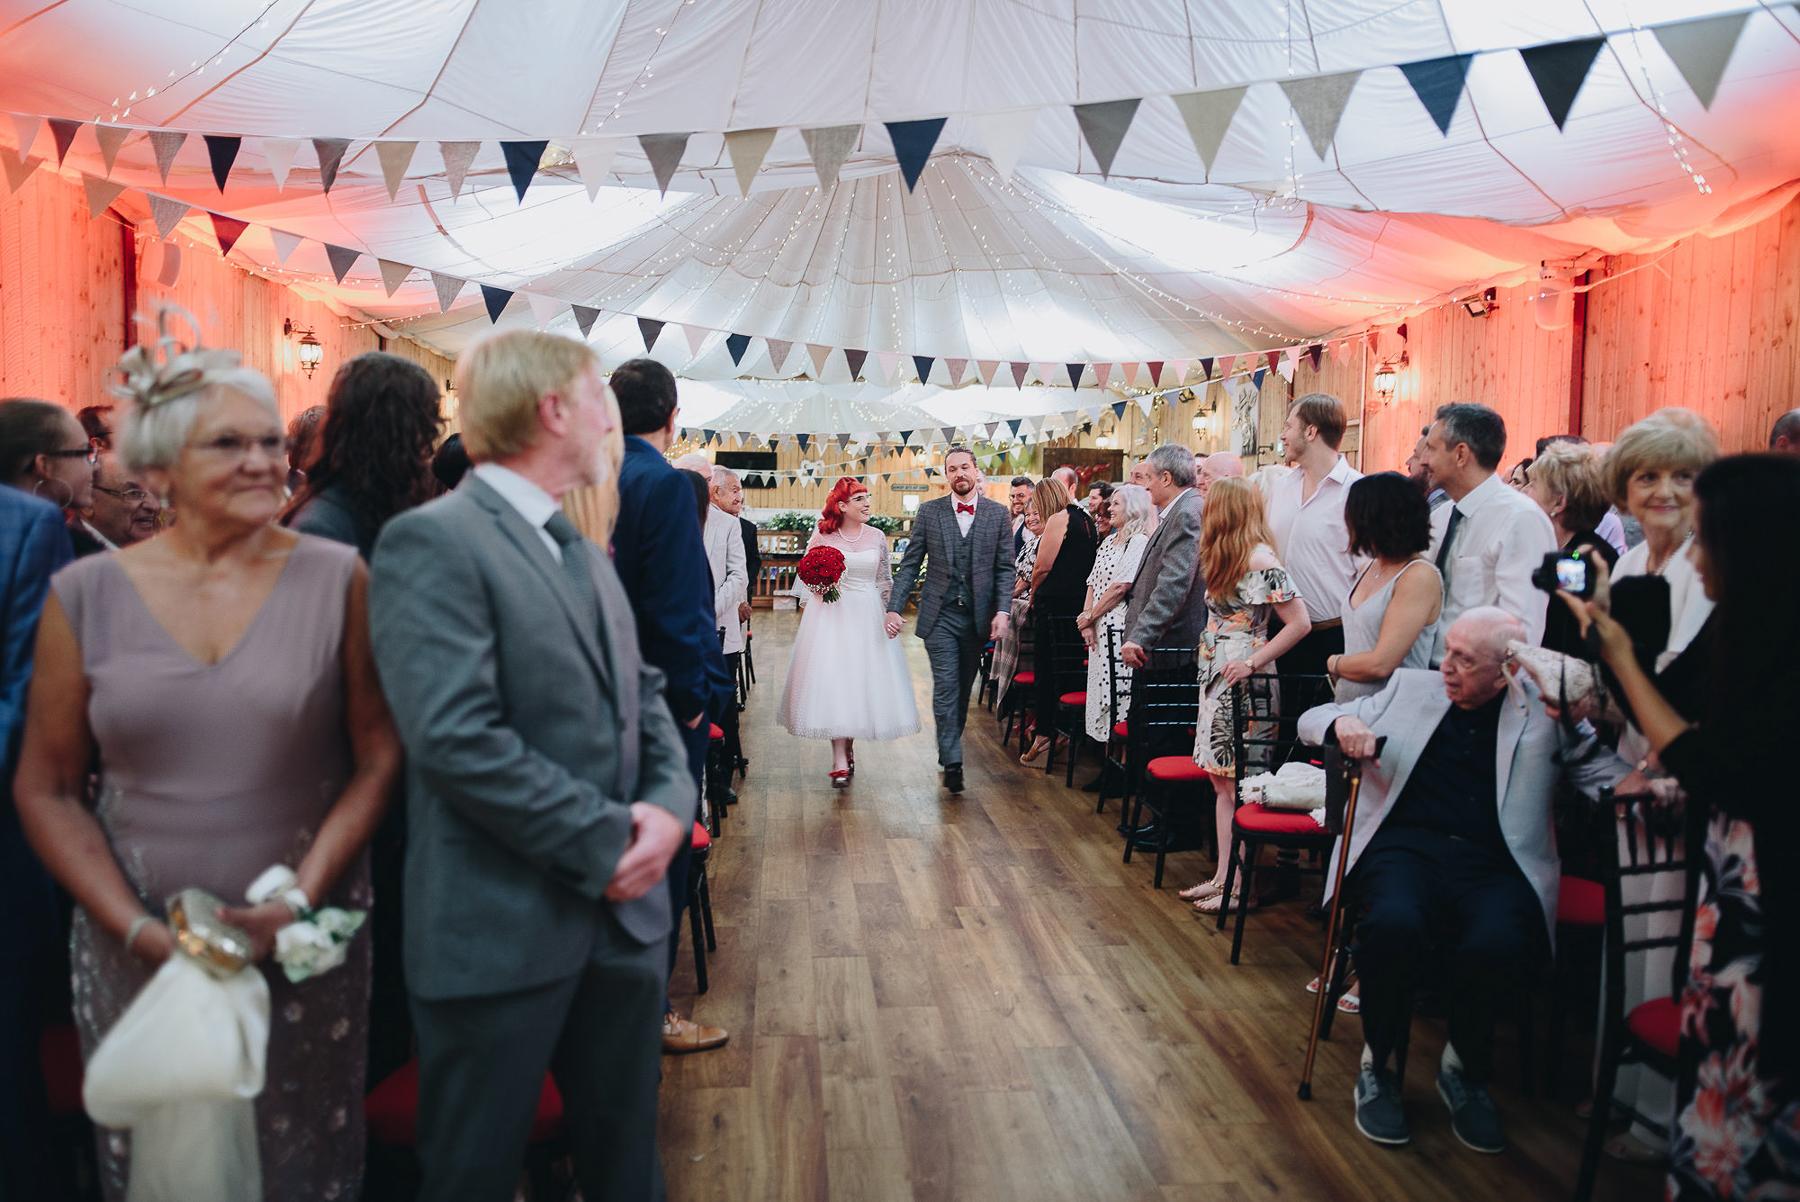 Wellbeing_Farm_Wedding_Photography_The_Pin-Up_Bride_Lara_Shaun-50.jpg